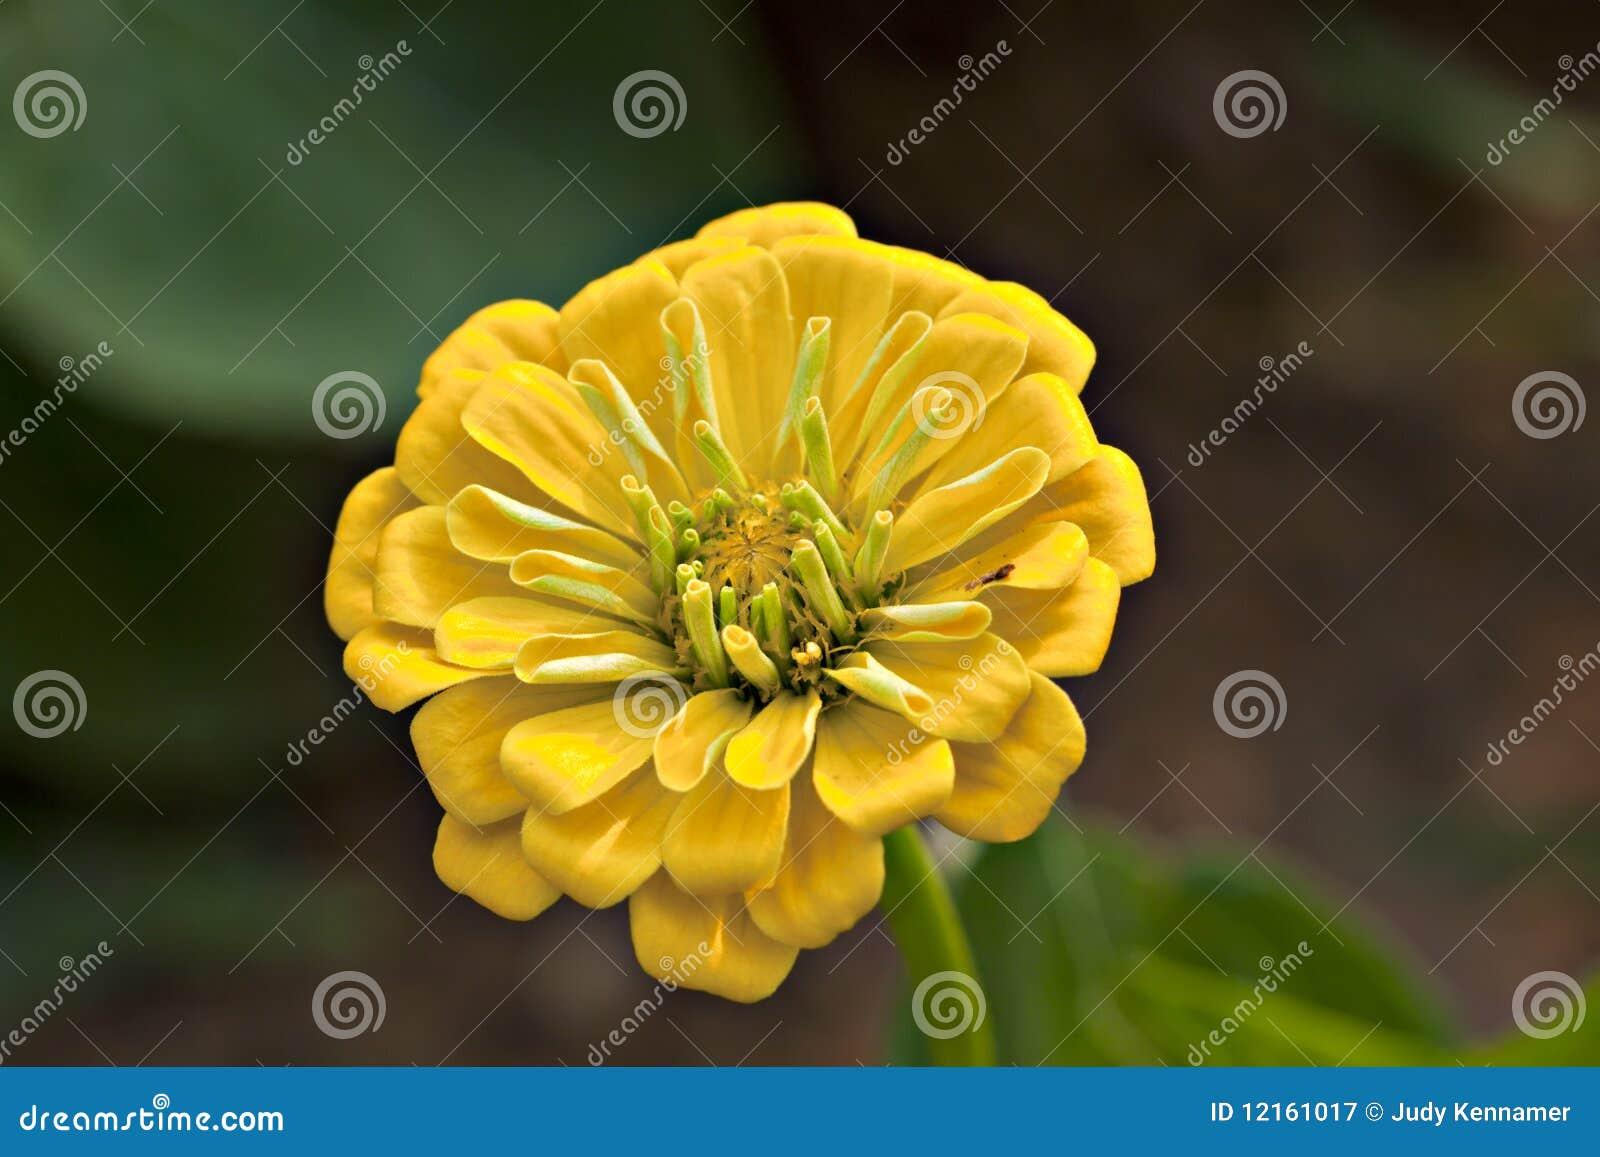 Yellow zinnia flower stock image image of beautiful 12161017 download comp mightylinksfo